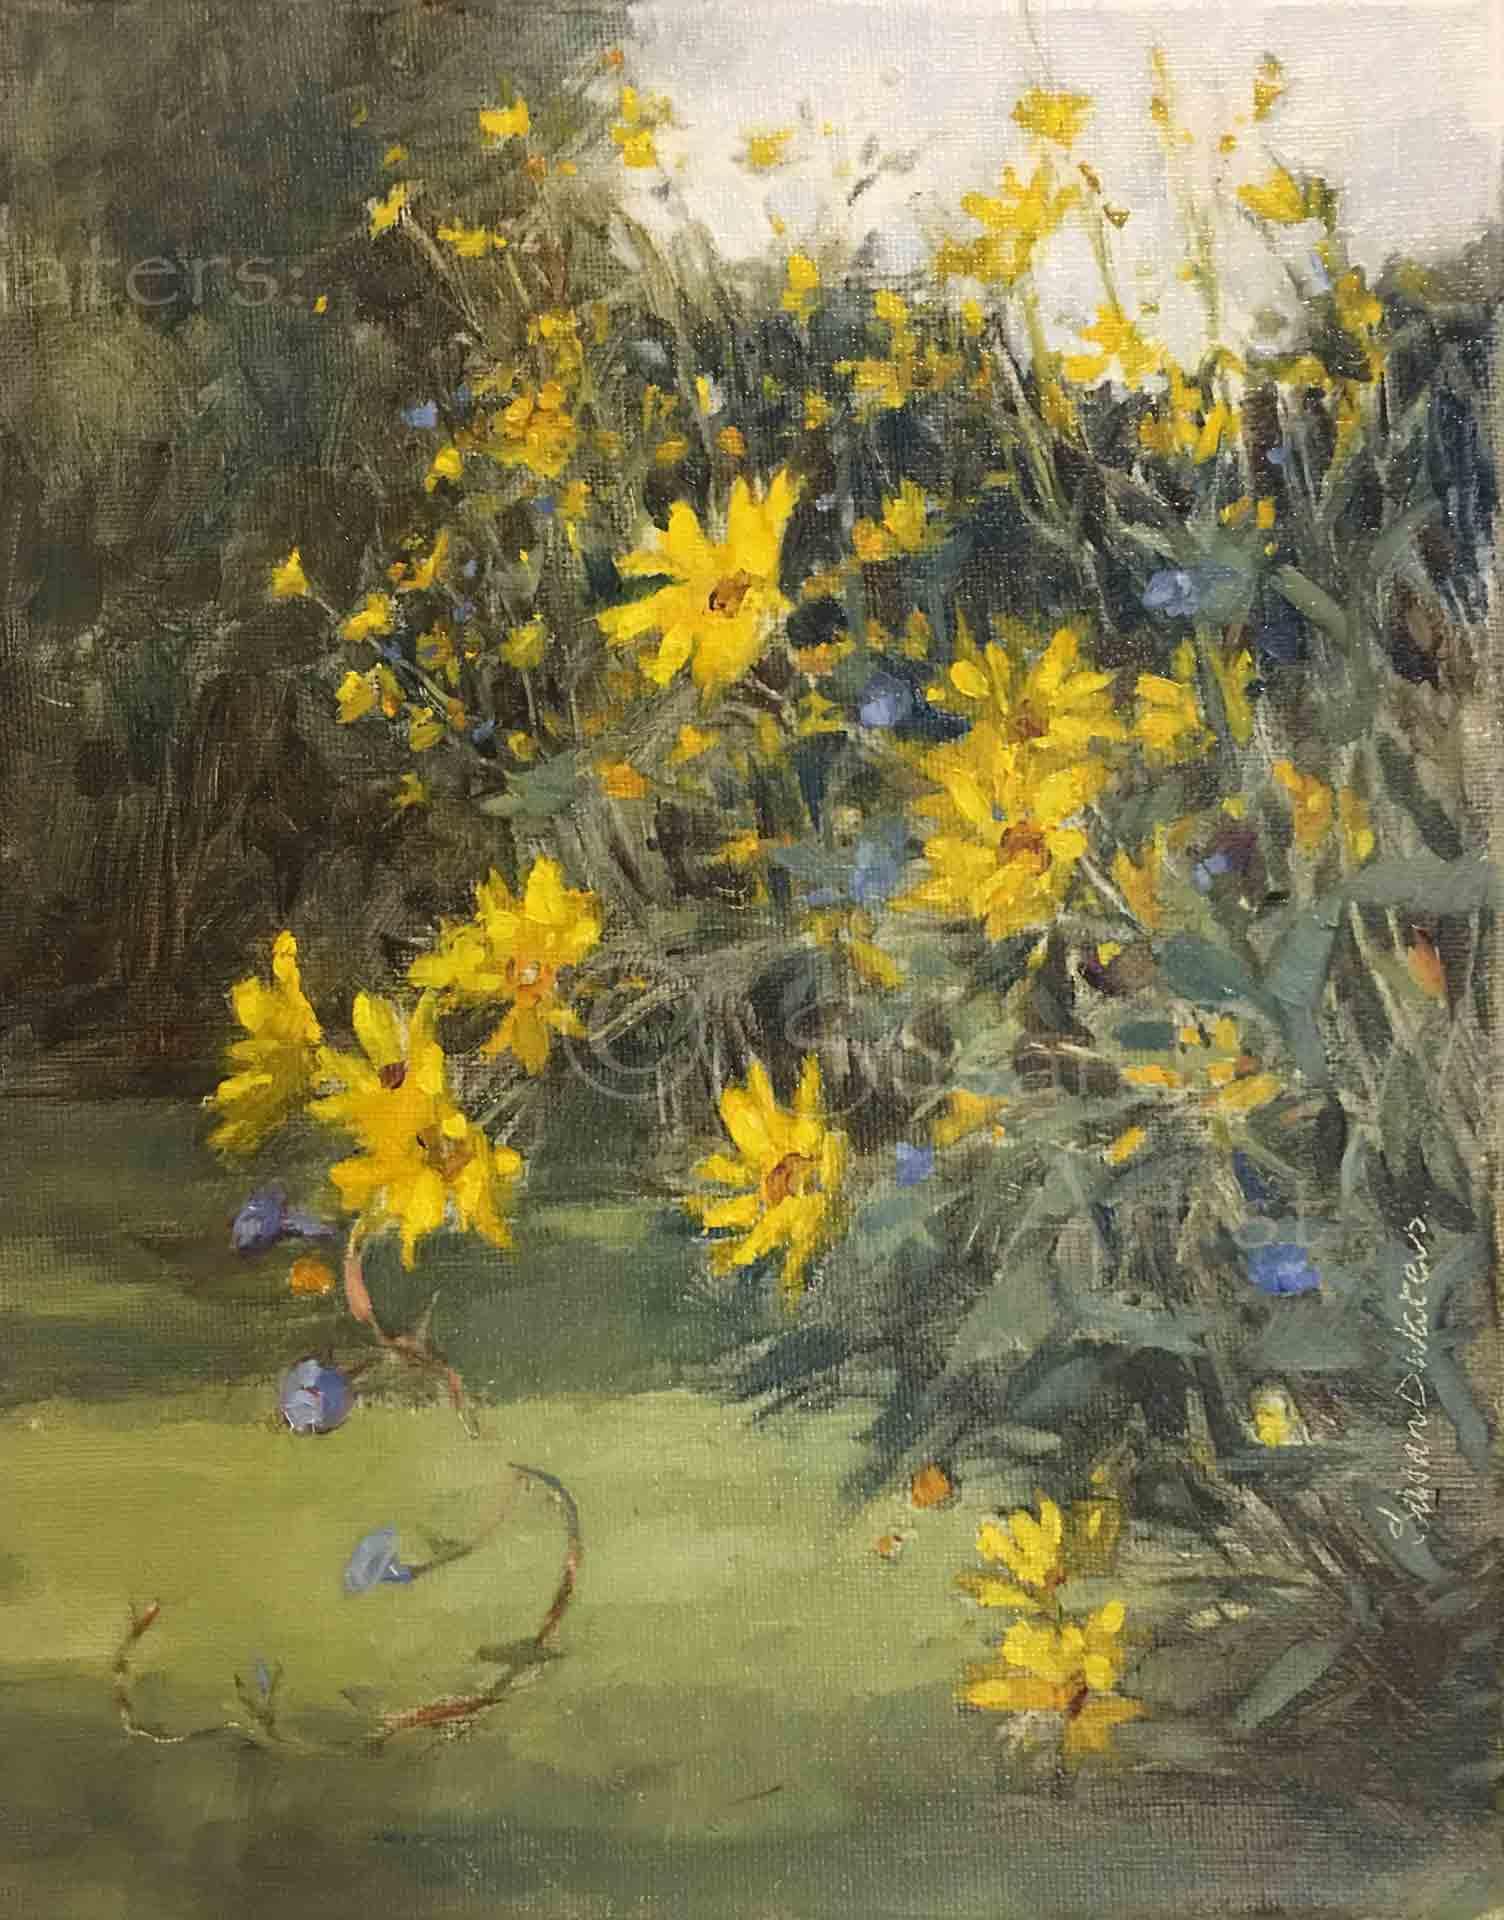 Maximiliani-and-Morning-Glories,-Susan-Duke-Waters